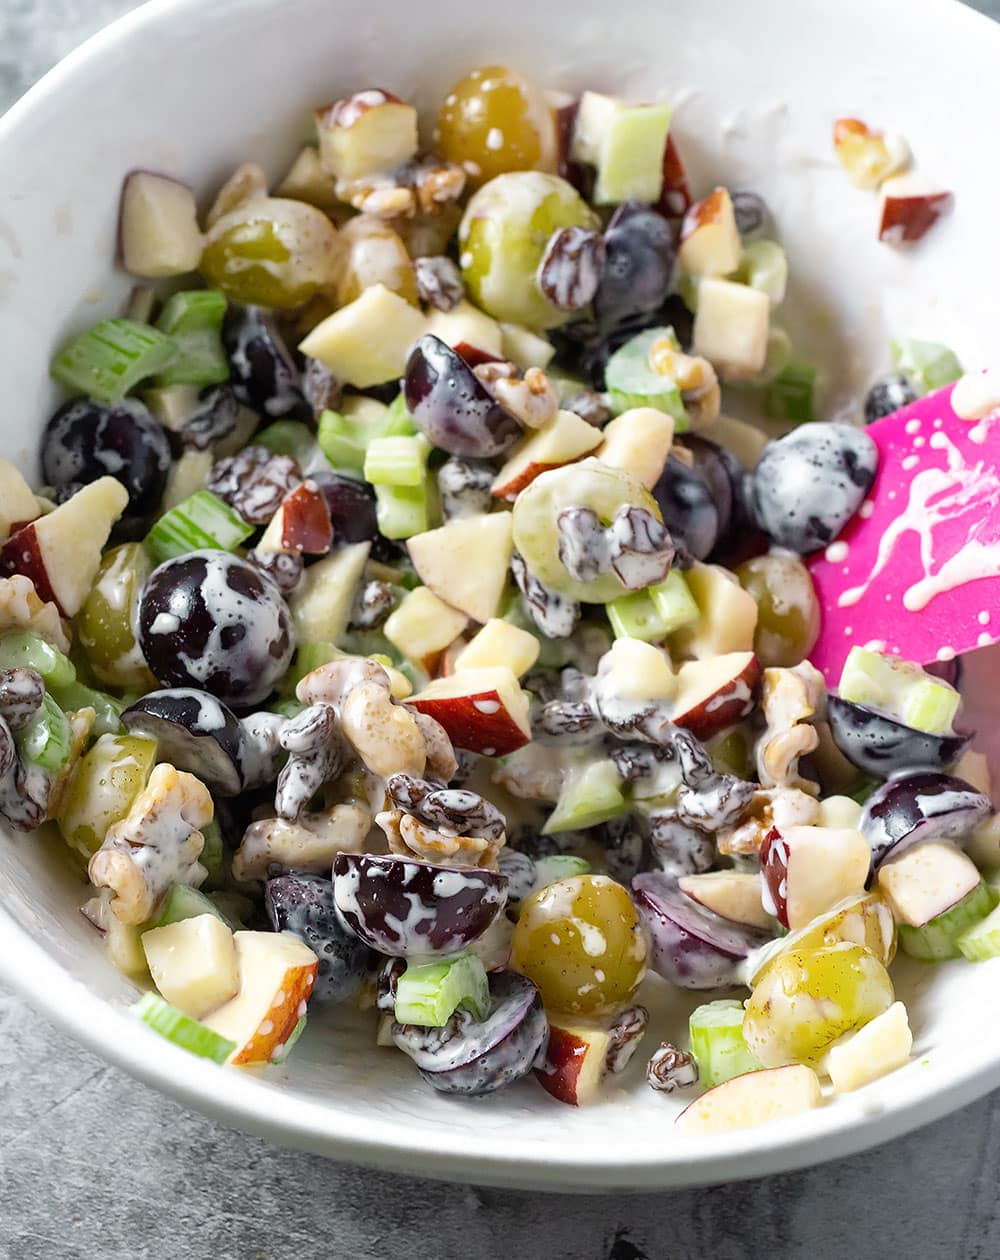 waldorf salad in a white bowl